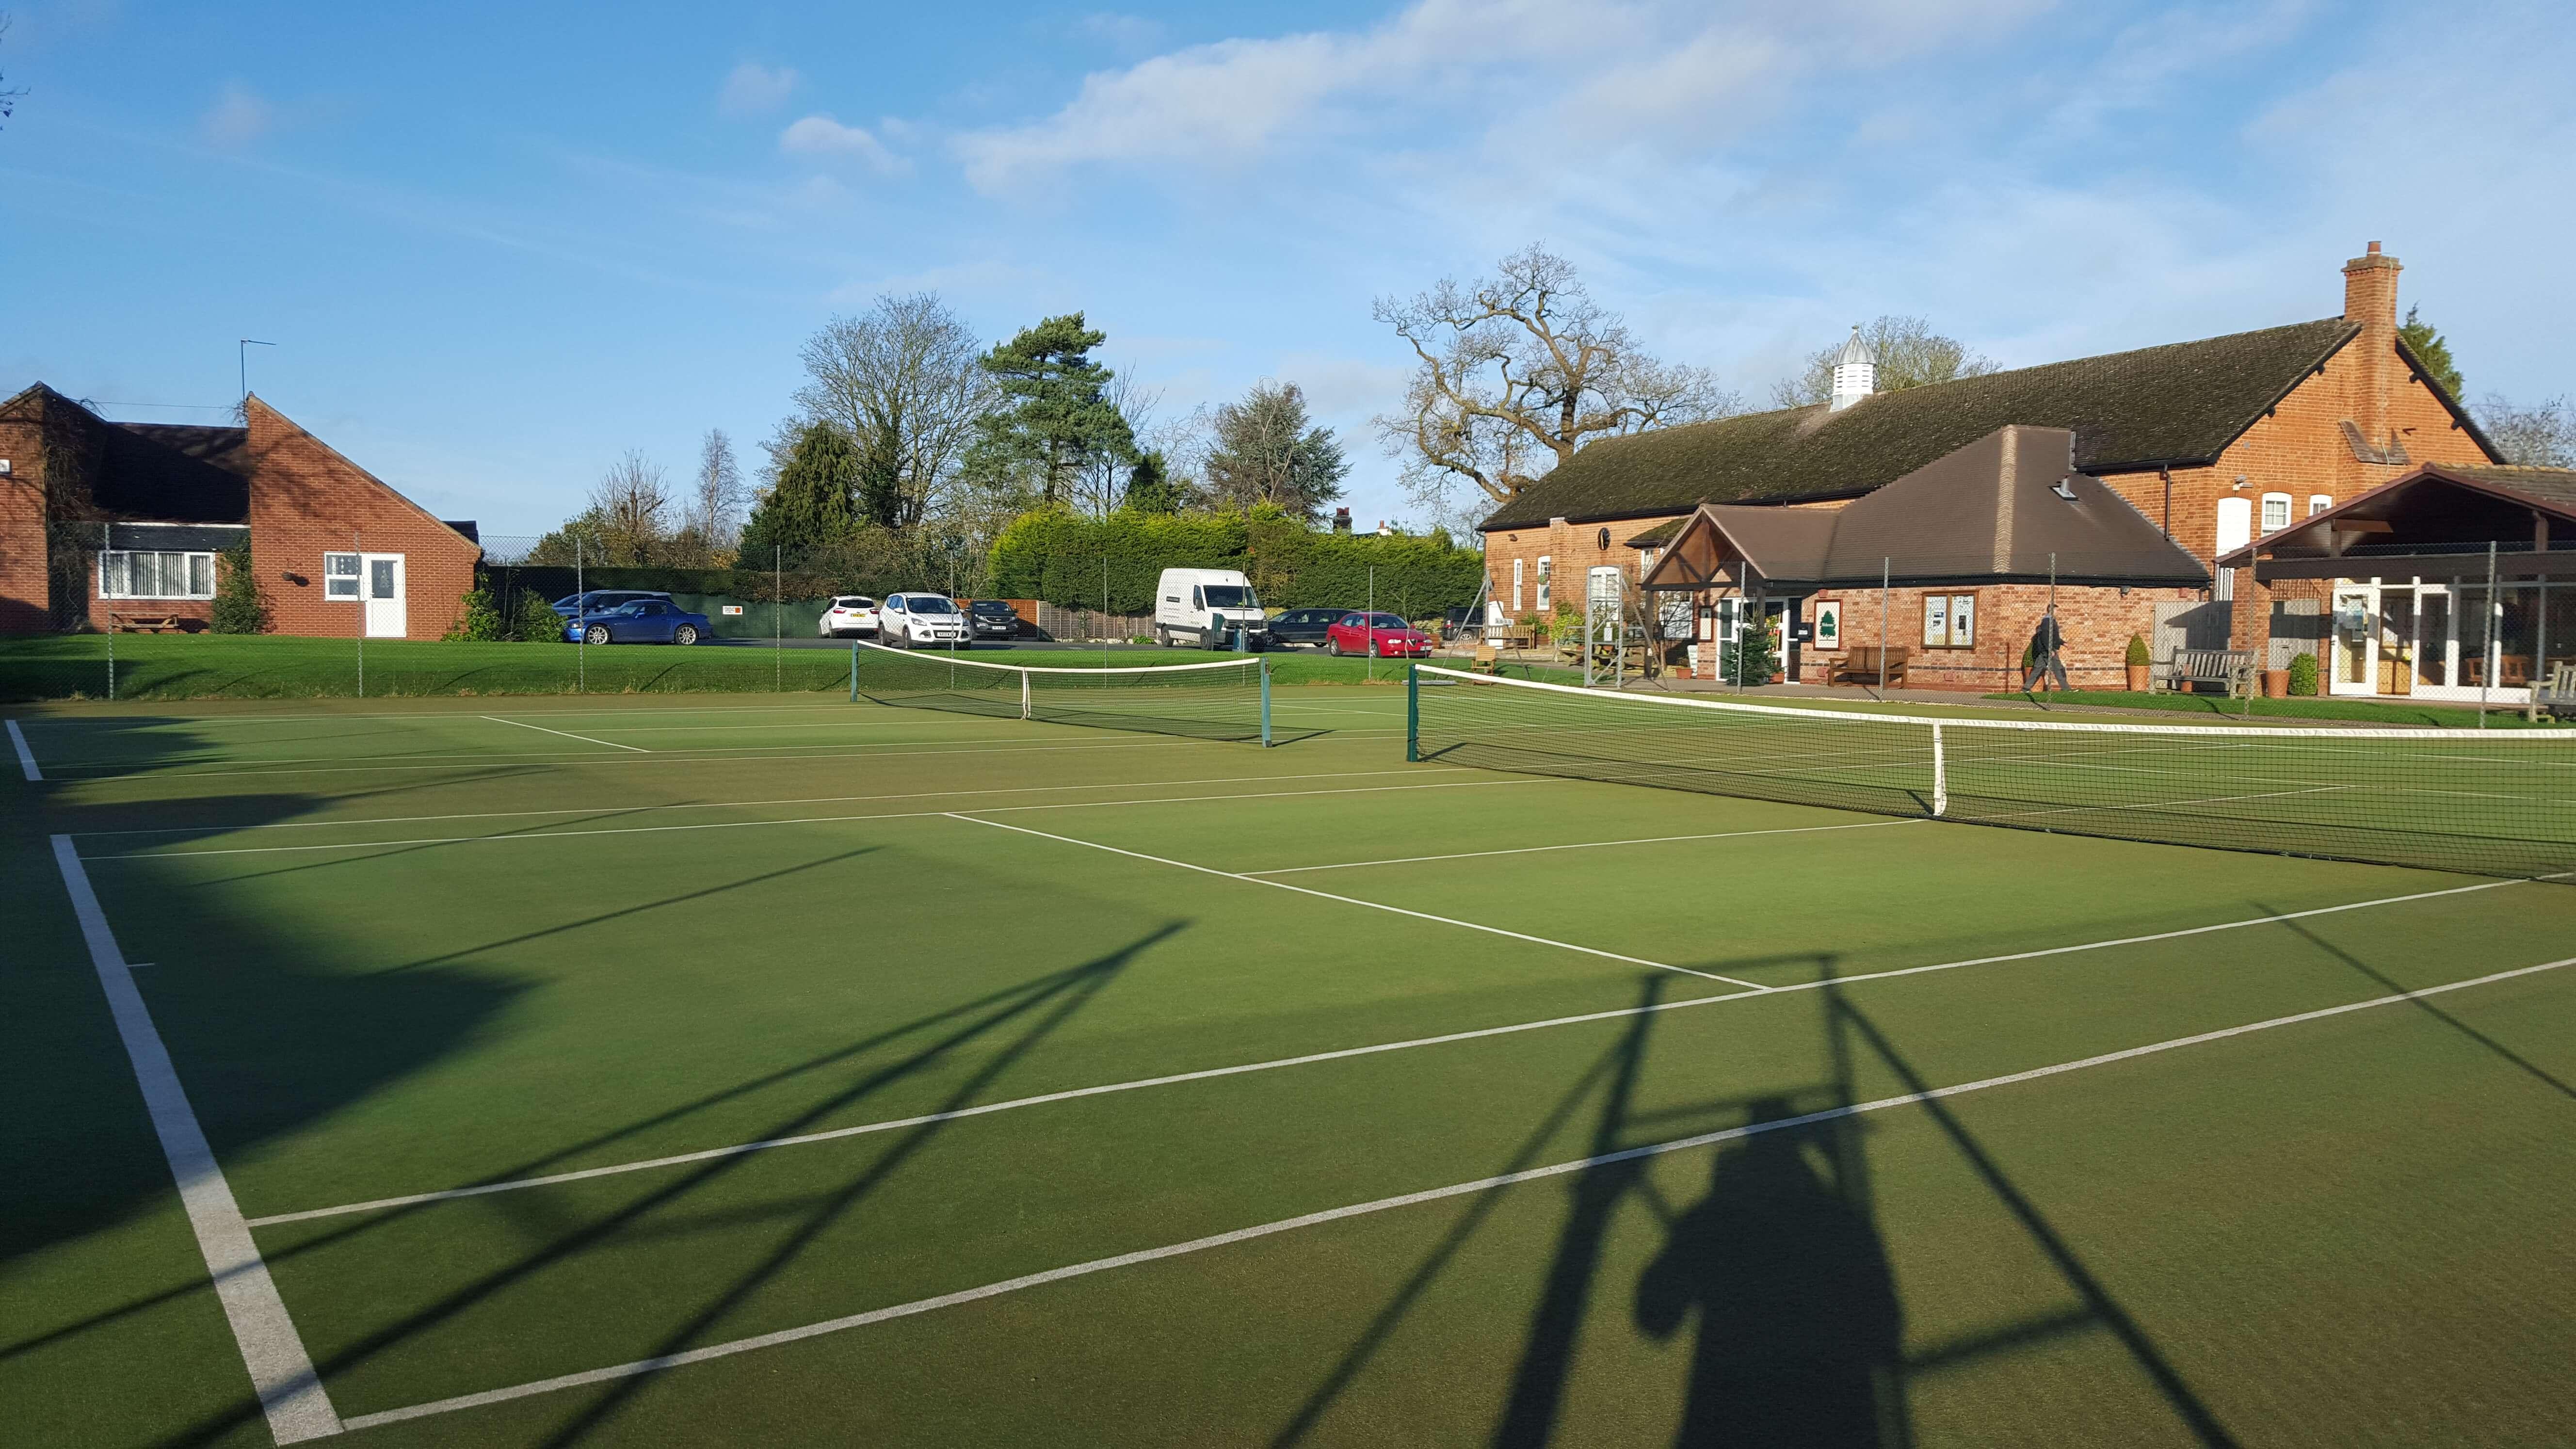 David Corrall – Claverdon Lawn Tennis Club